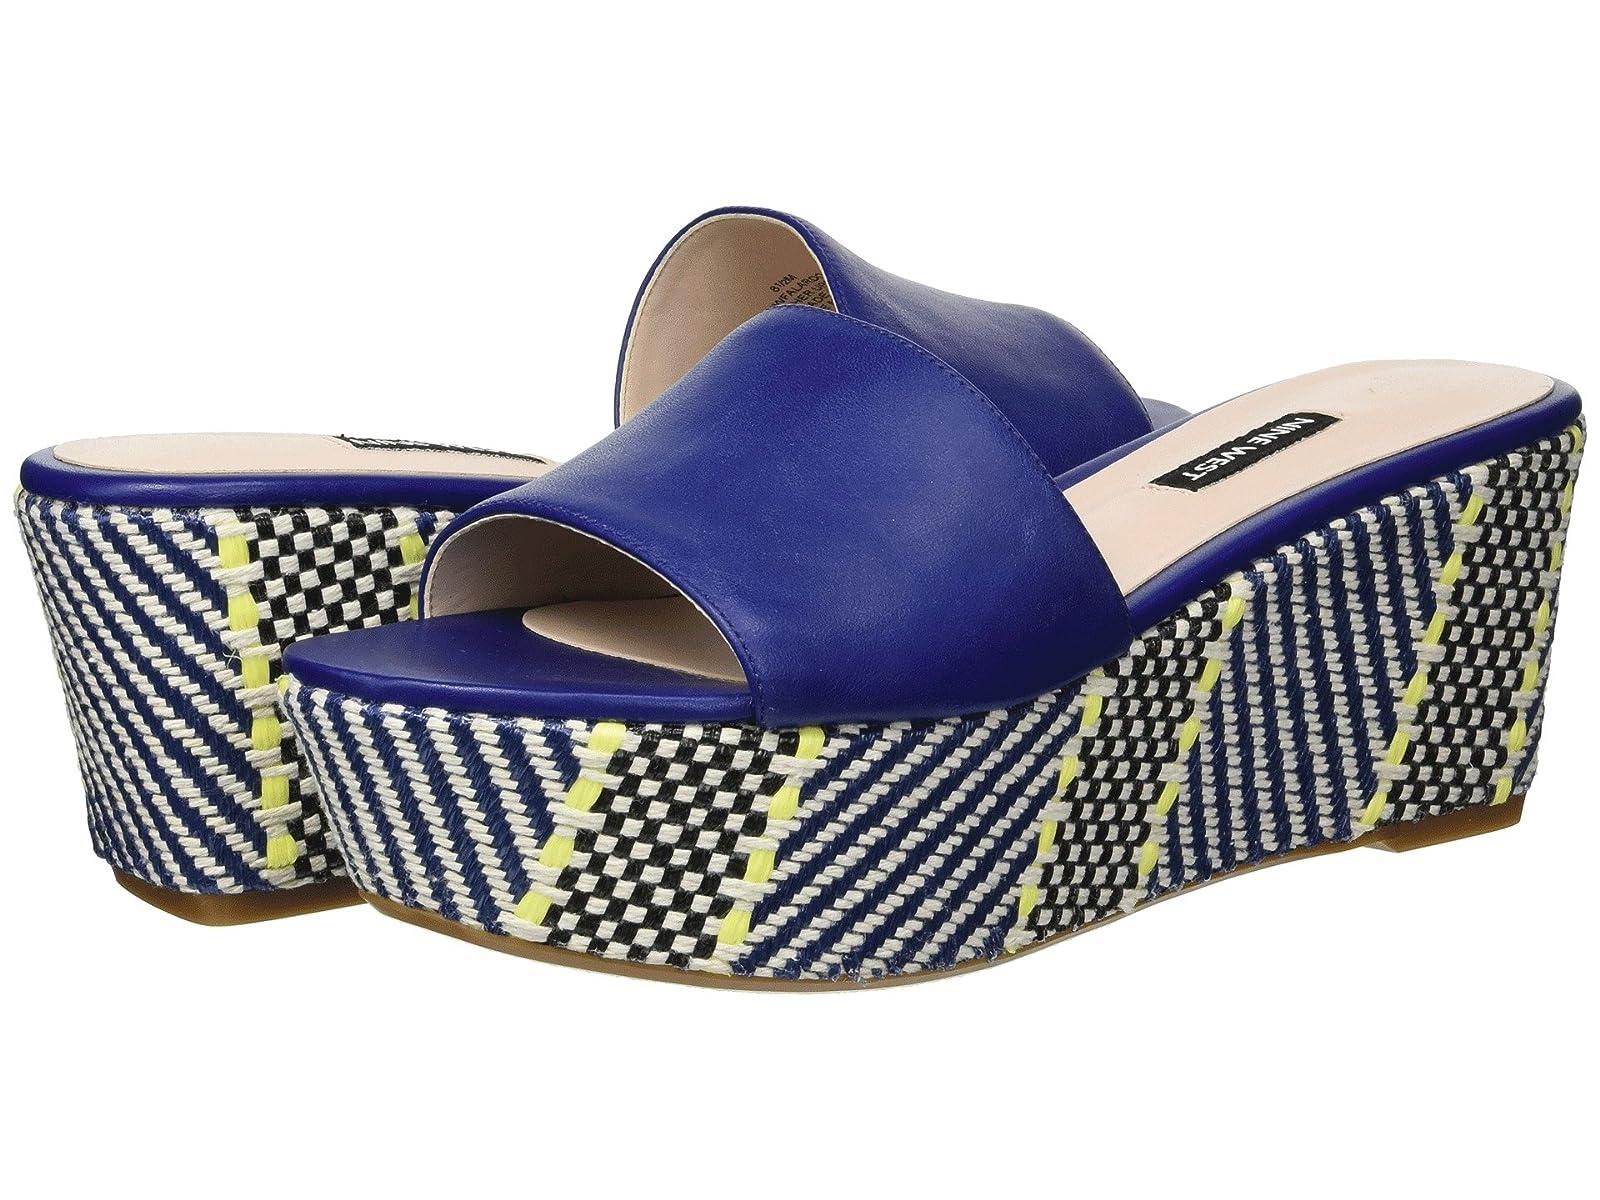 Nine West Falardo Platform Wedge Slide SandalCheap and distinctive eye-catching shoes